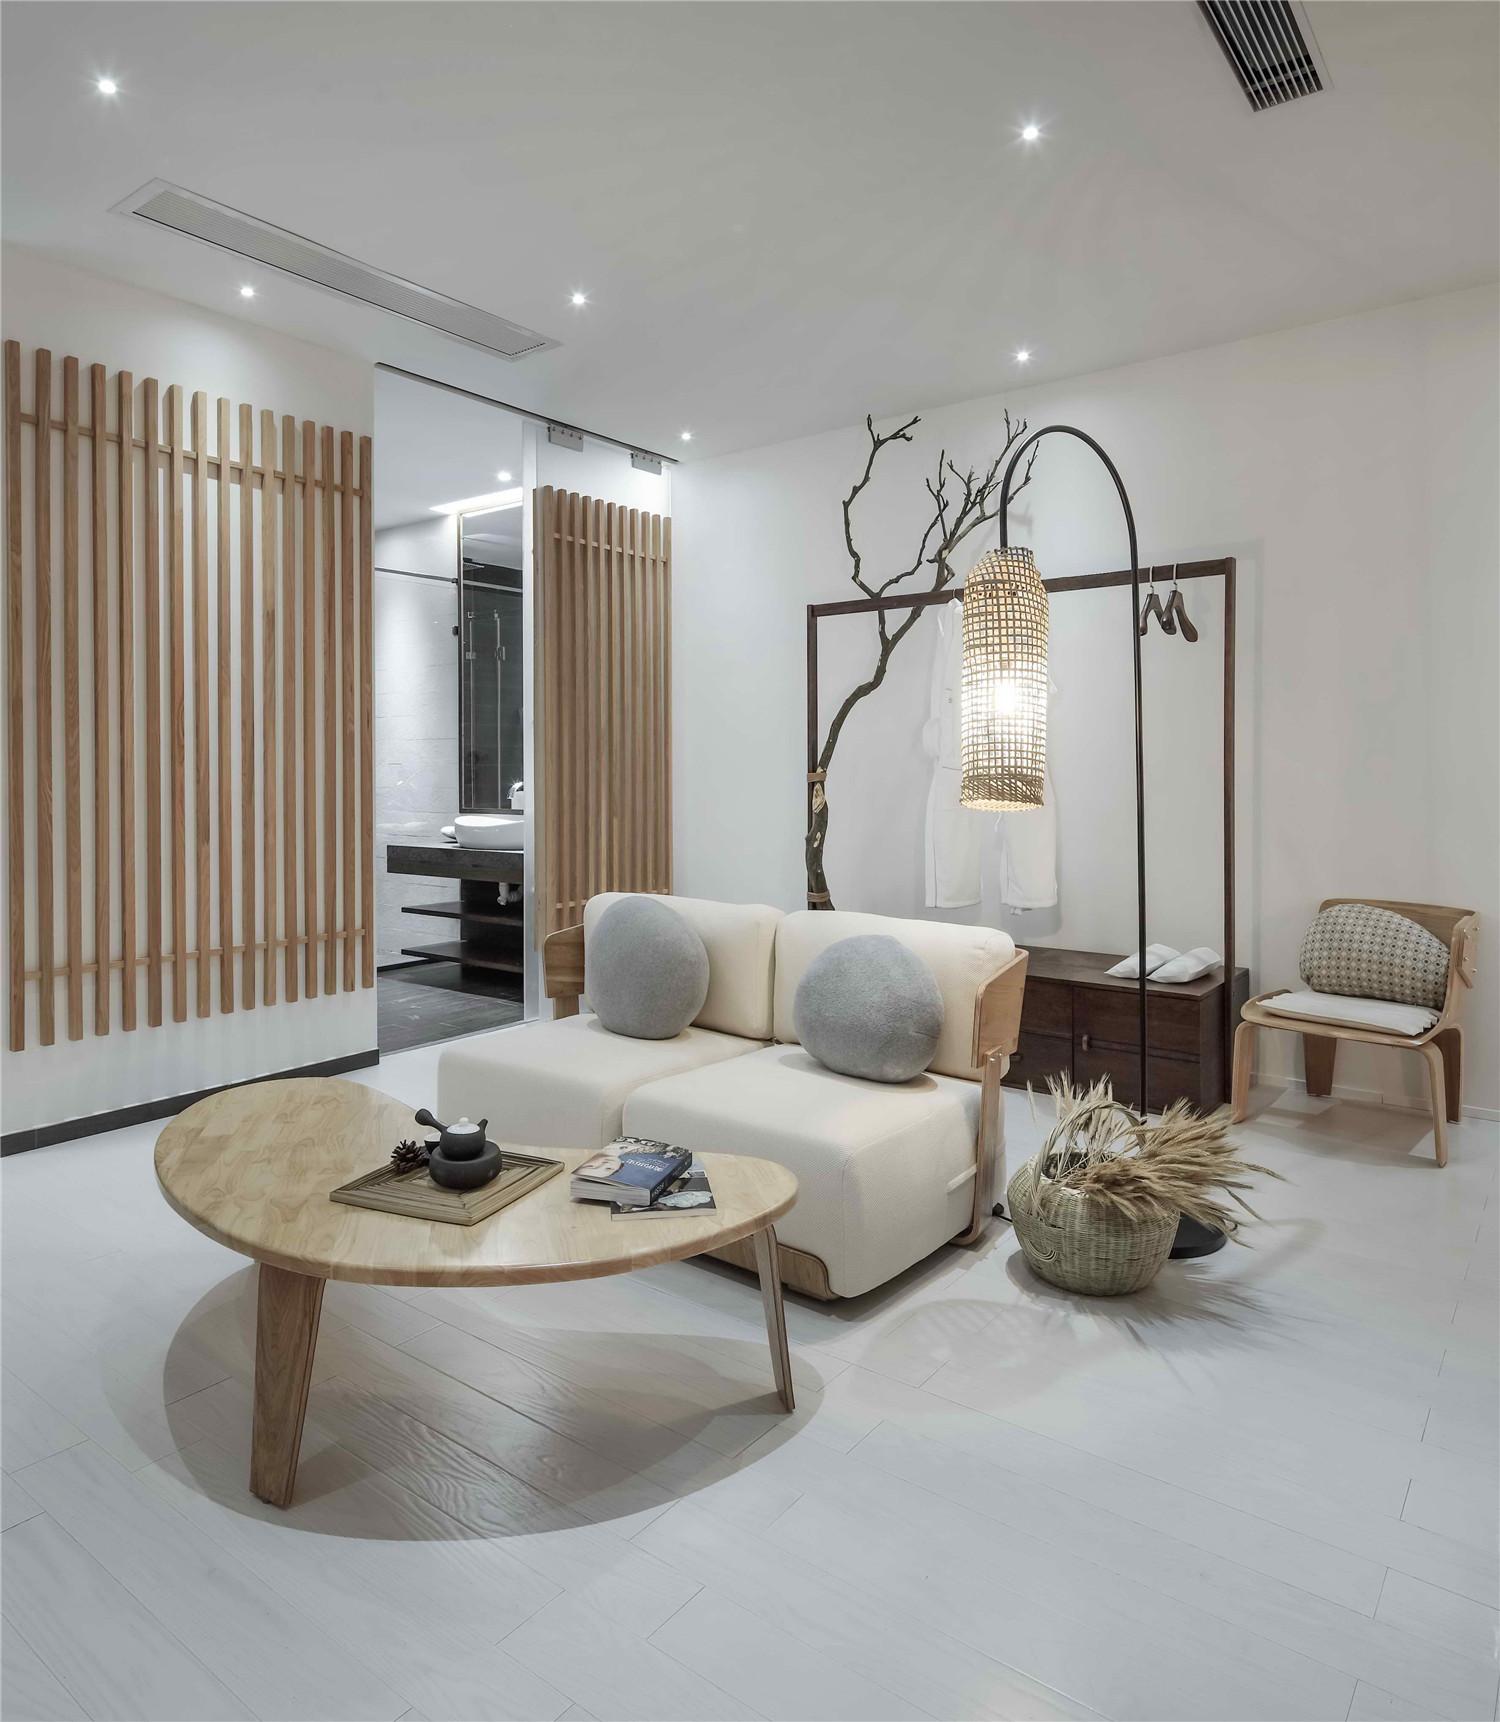 Ripple Hotel - Qiandao Lake design brief Hisheji (61)